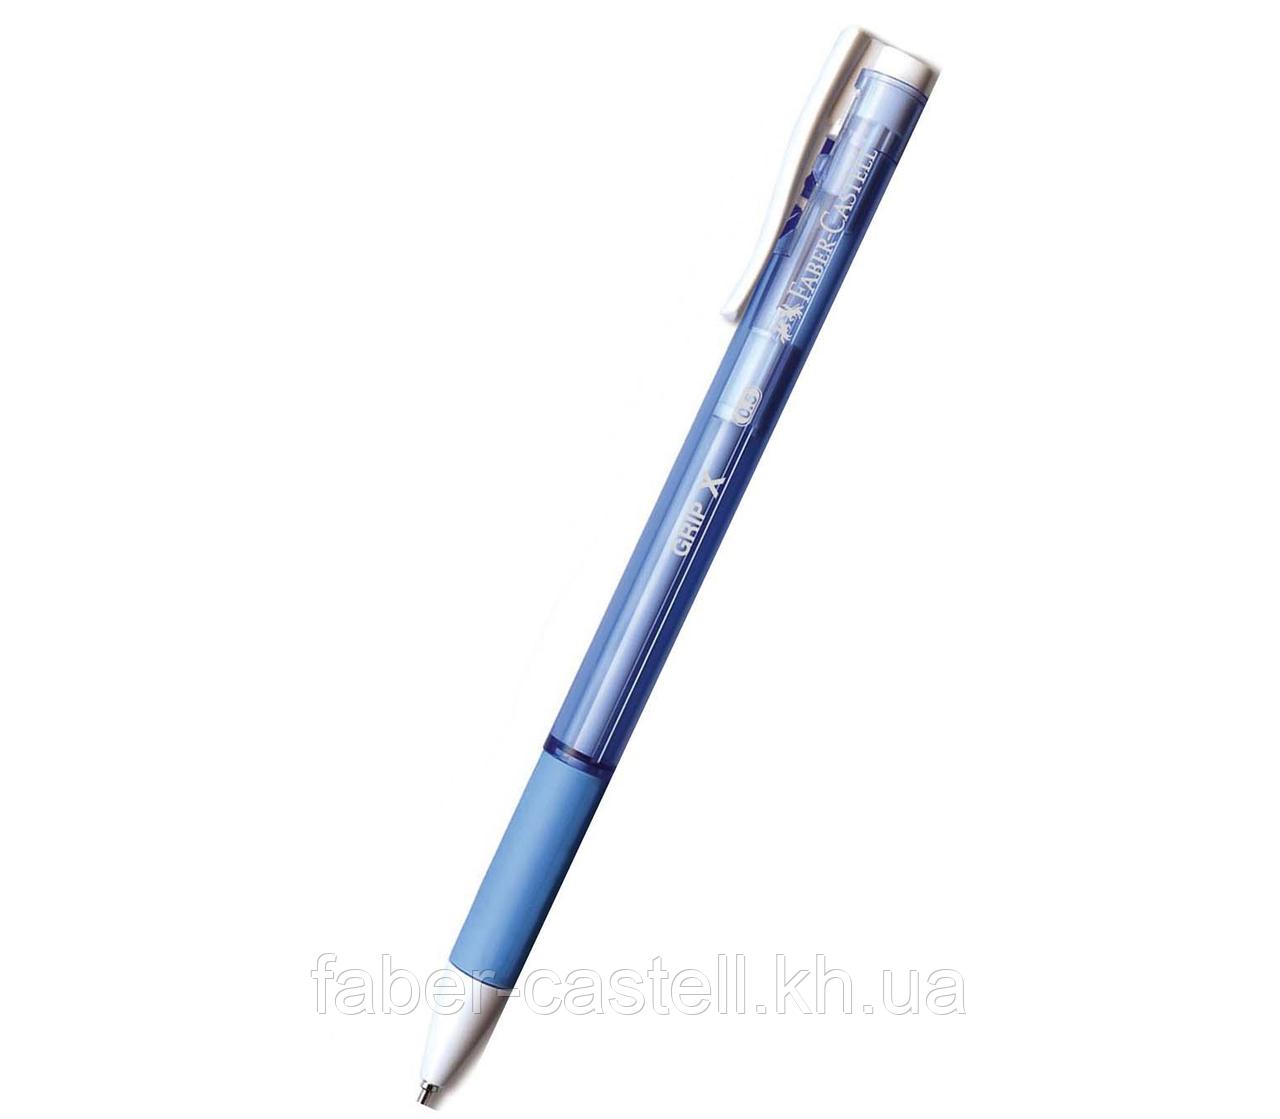 Ручка кулькова Faber-Castell GRIP Х, синя 0,5 мм, 545051